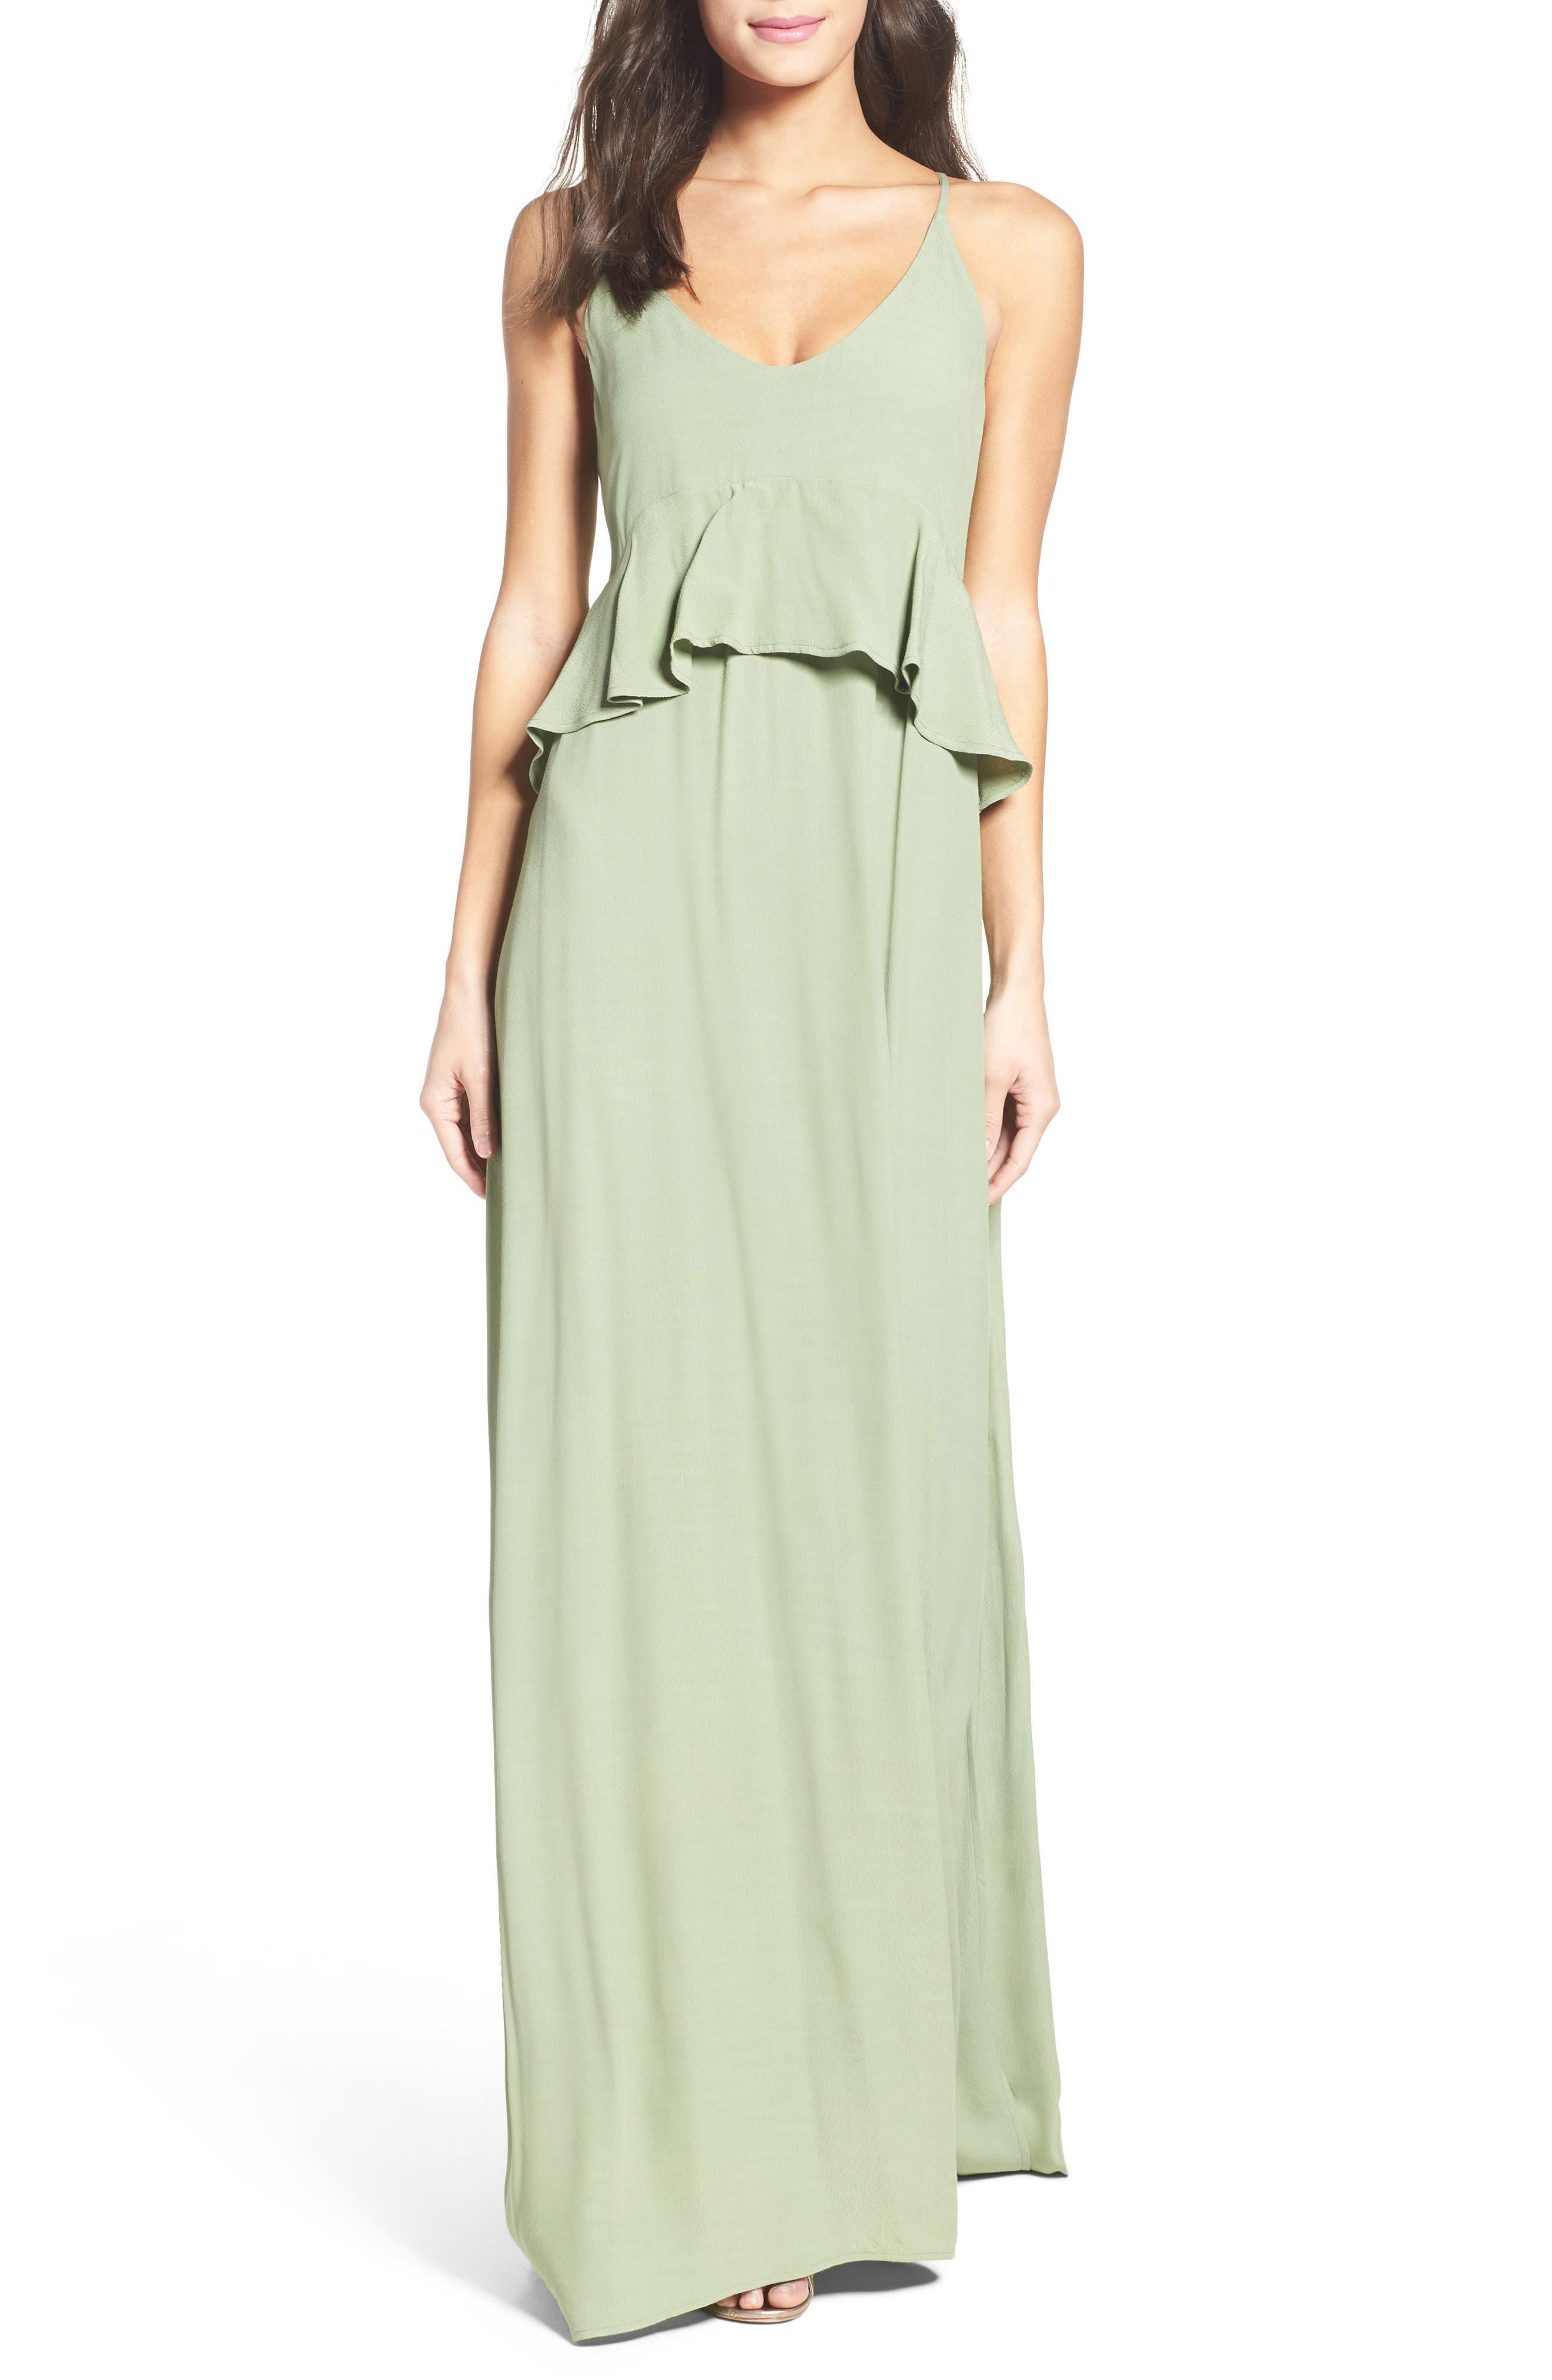 Roe + May Jolie Crepe Peplum Dress,                             Main thumbnail 1, color,                             310